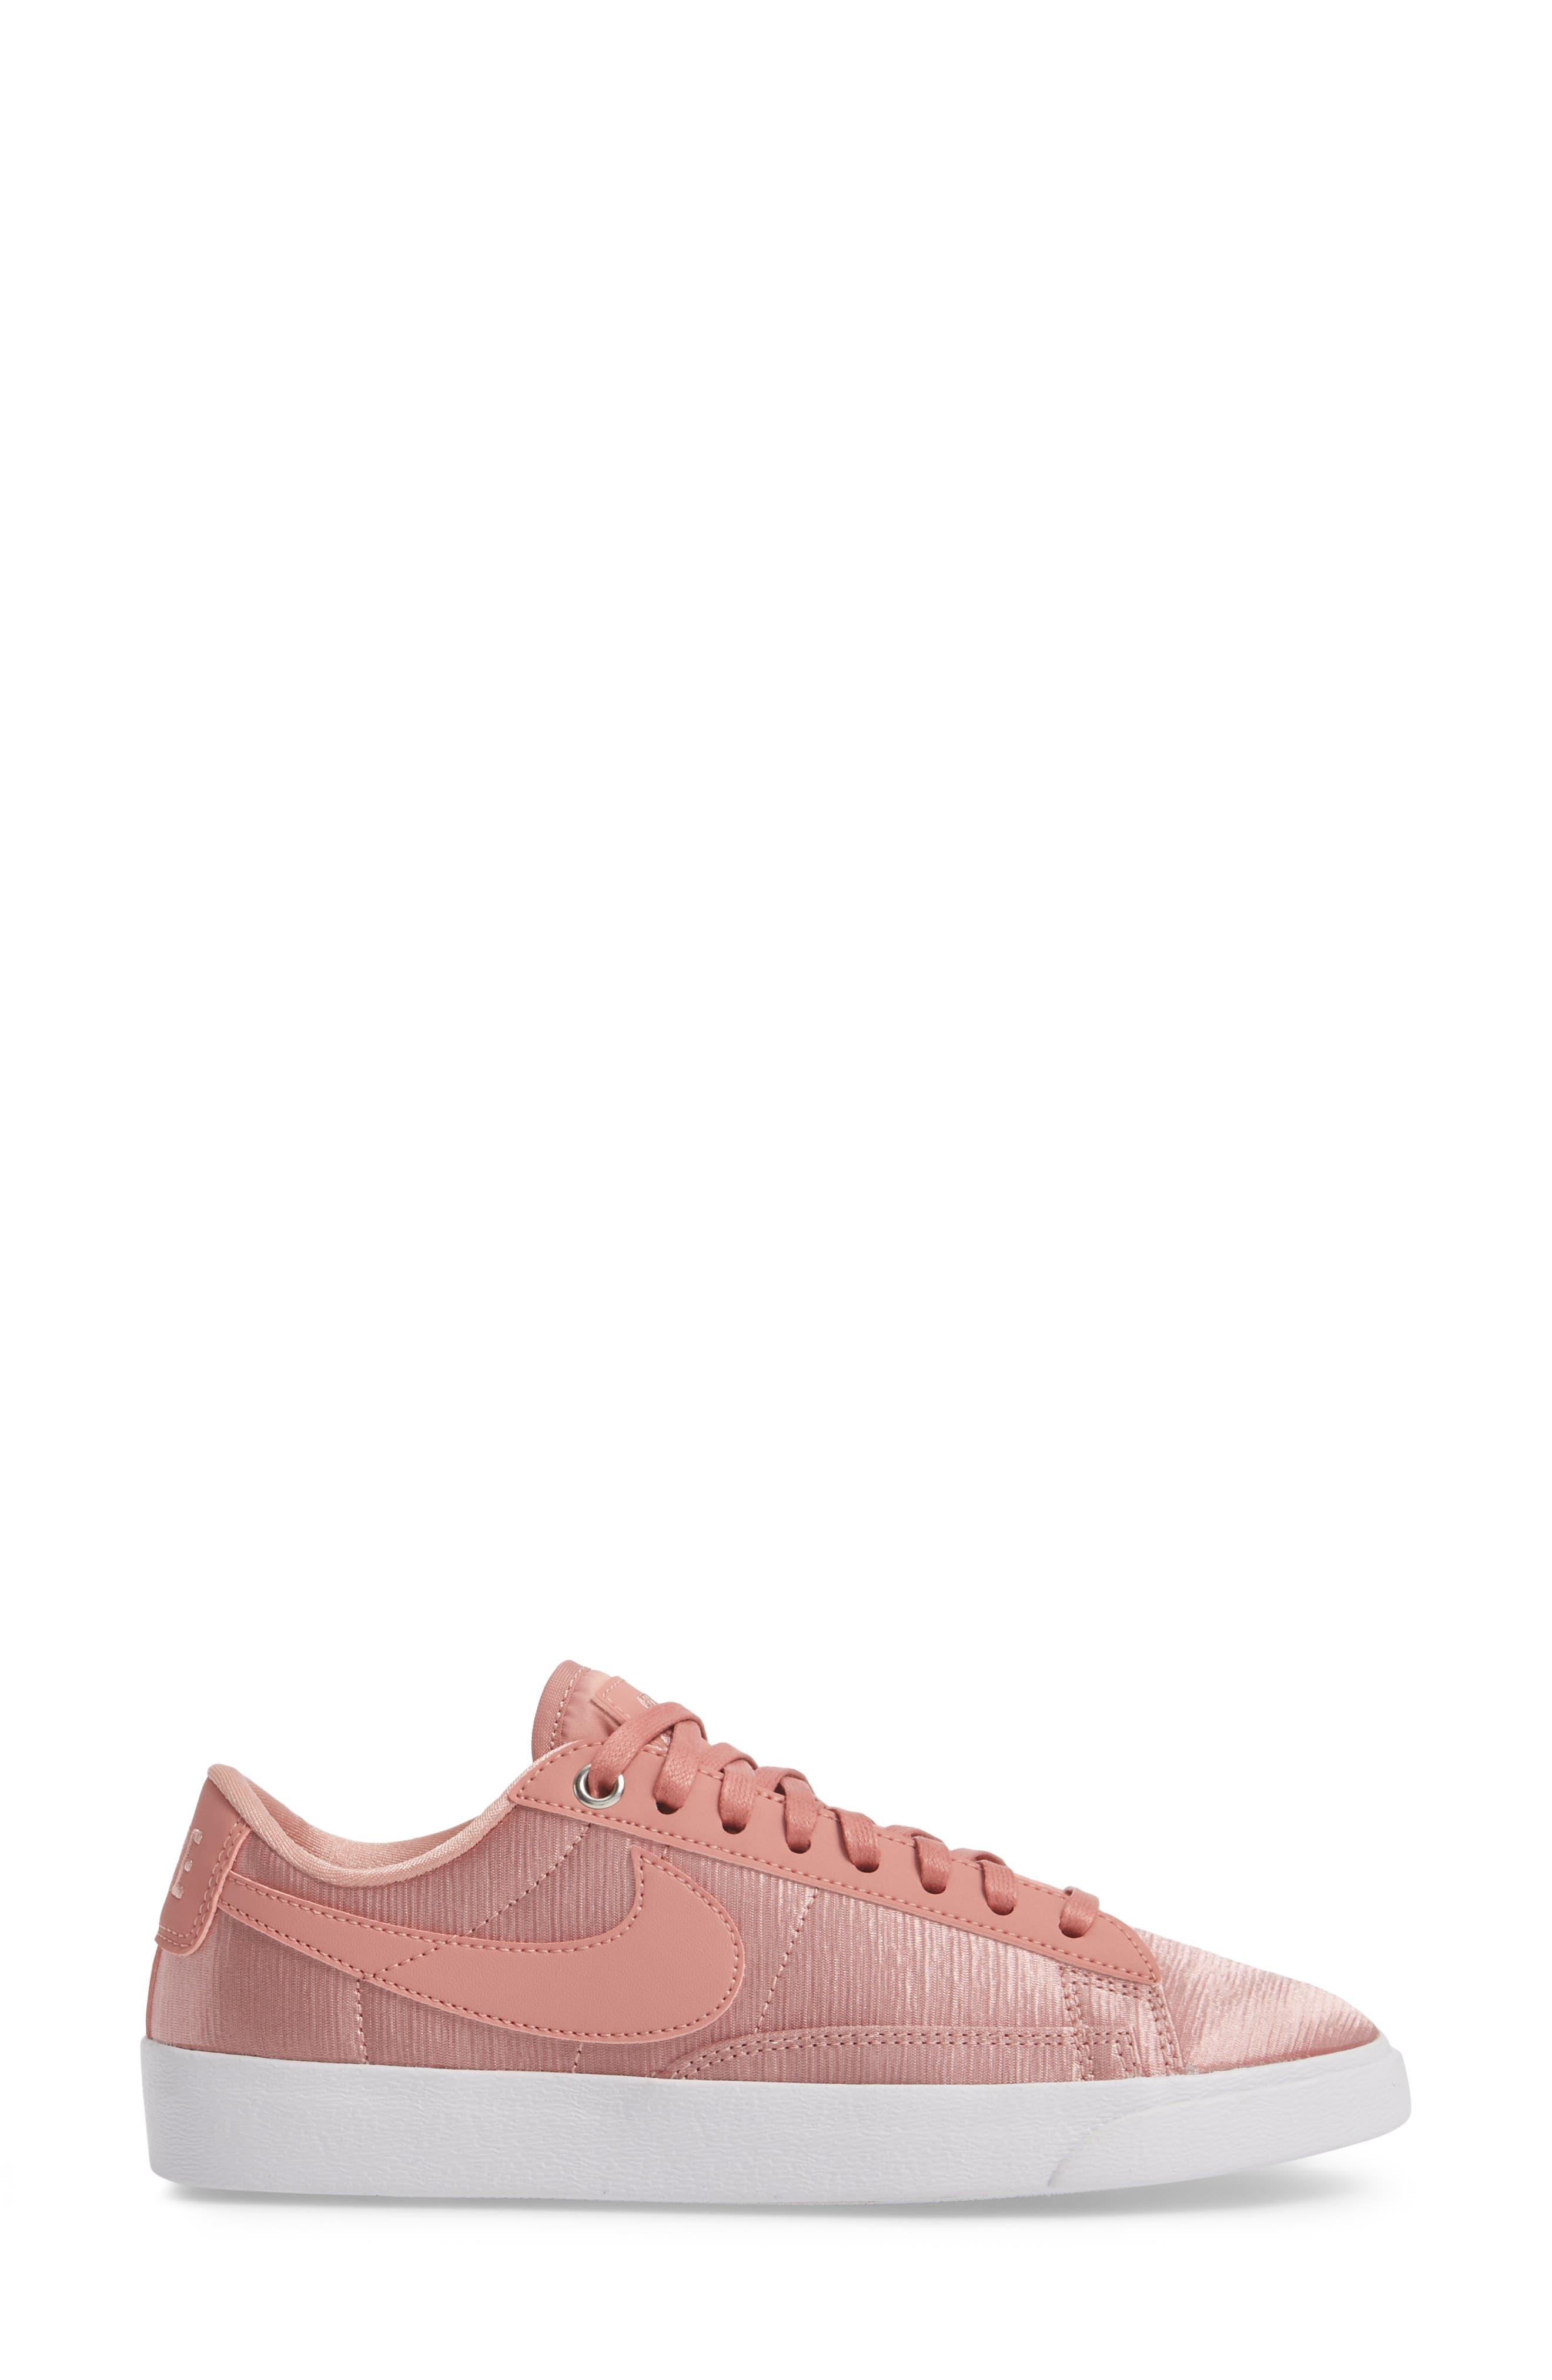 Blazer Low SE Sneaker,                             Alternate thumbnail 3, color,                             RUST PINK/ RUST PINK